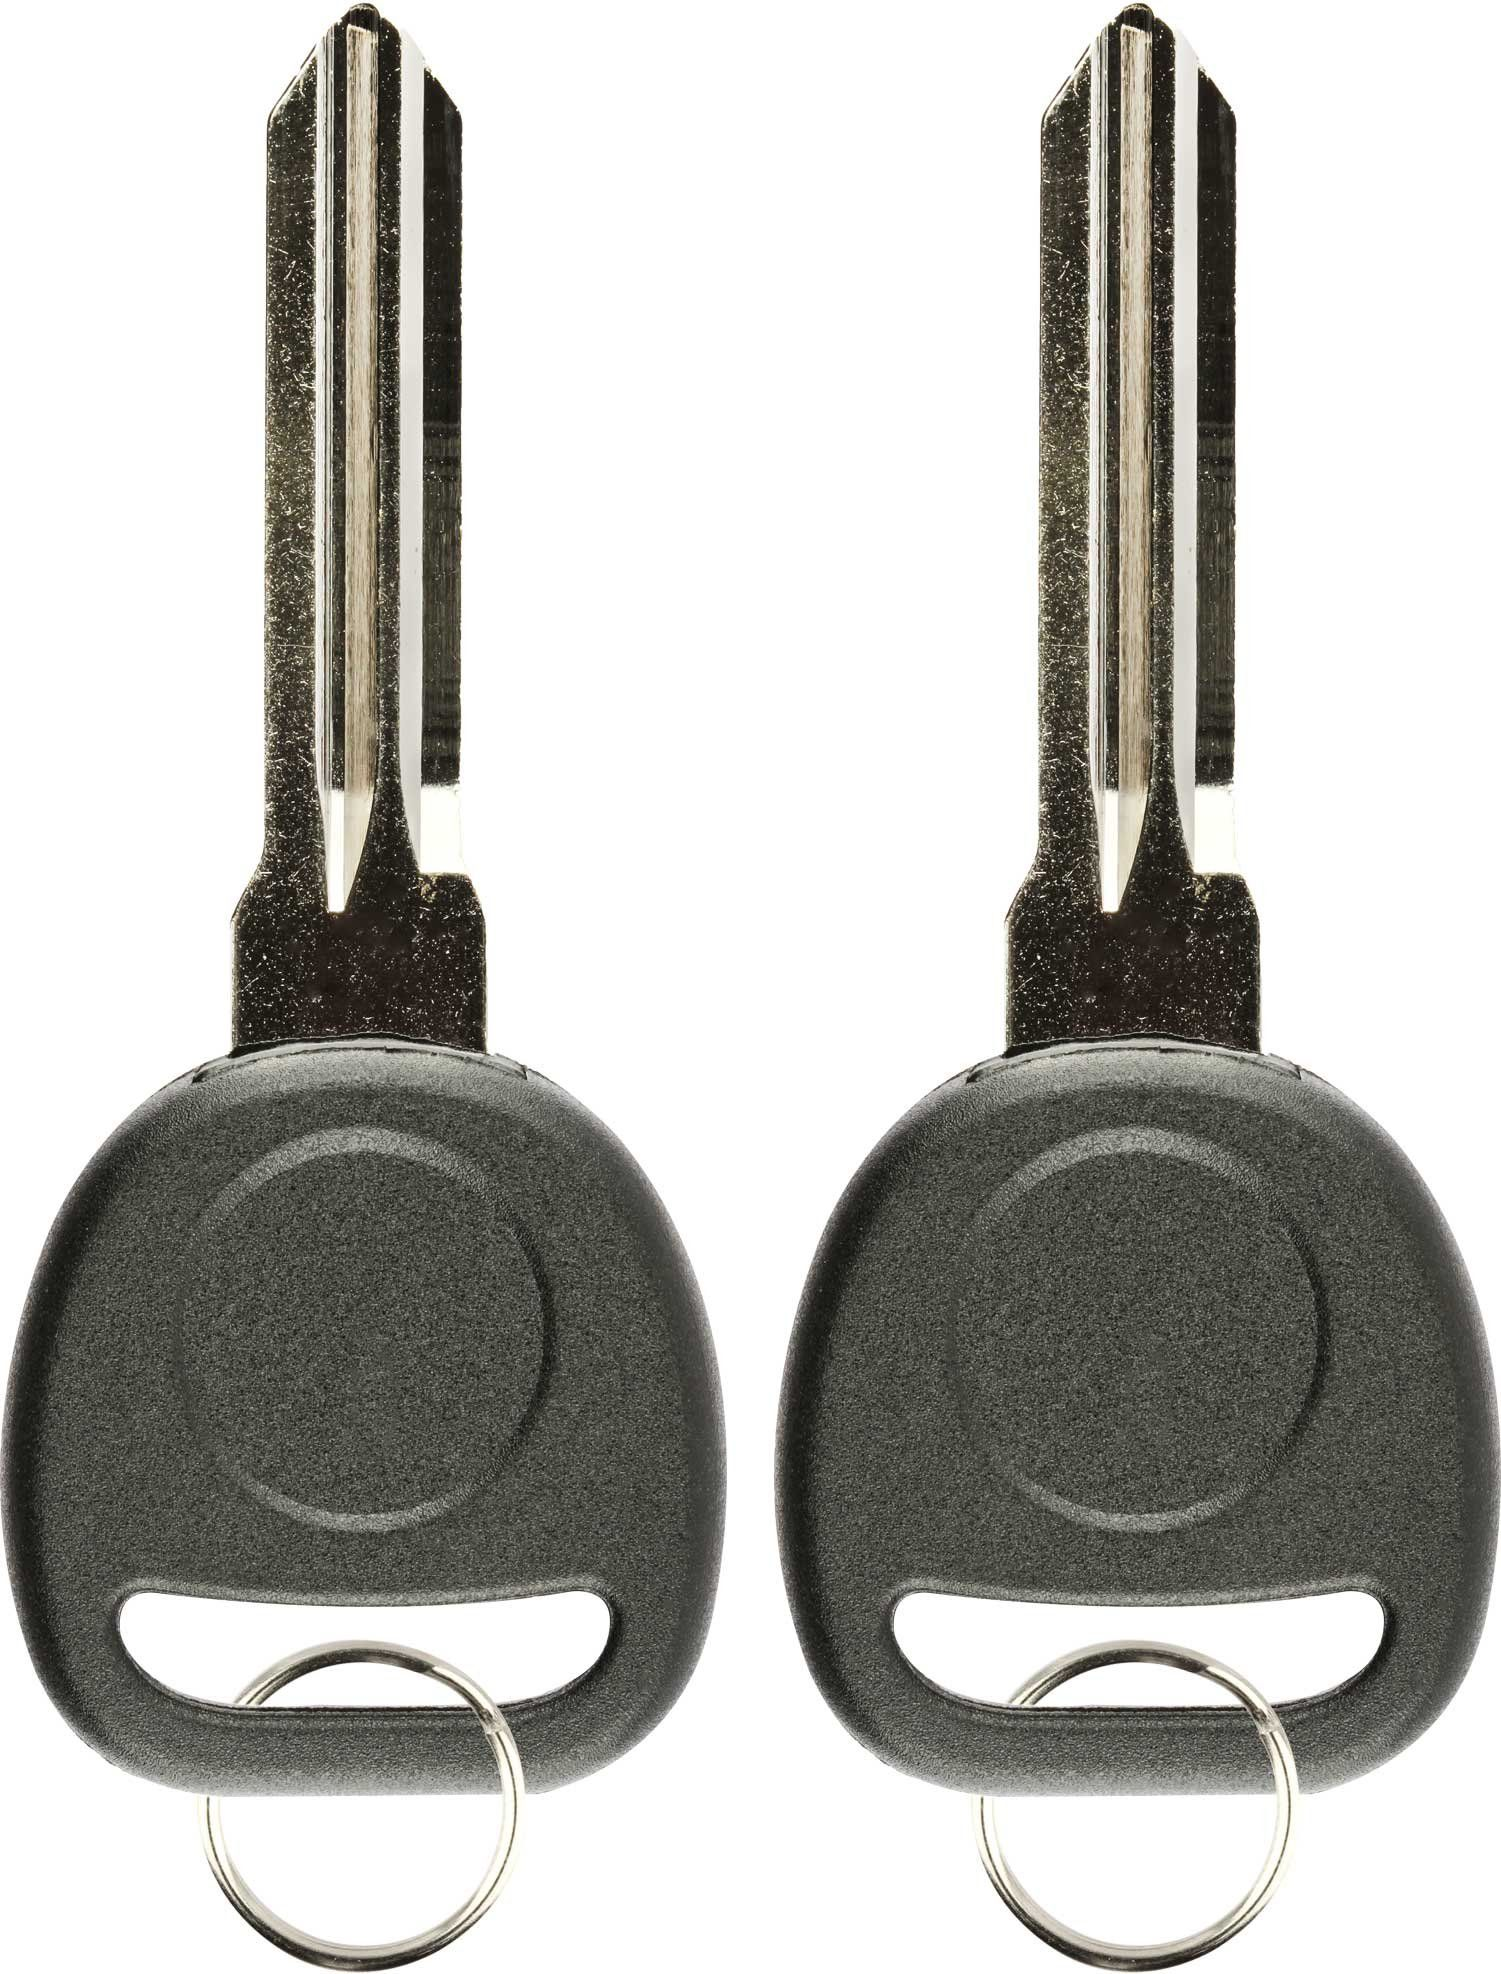 Keylessoption Replacement Uncut Transponder Chip Key Blank